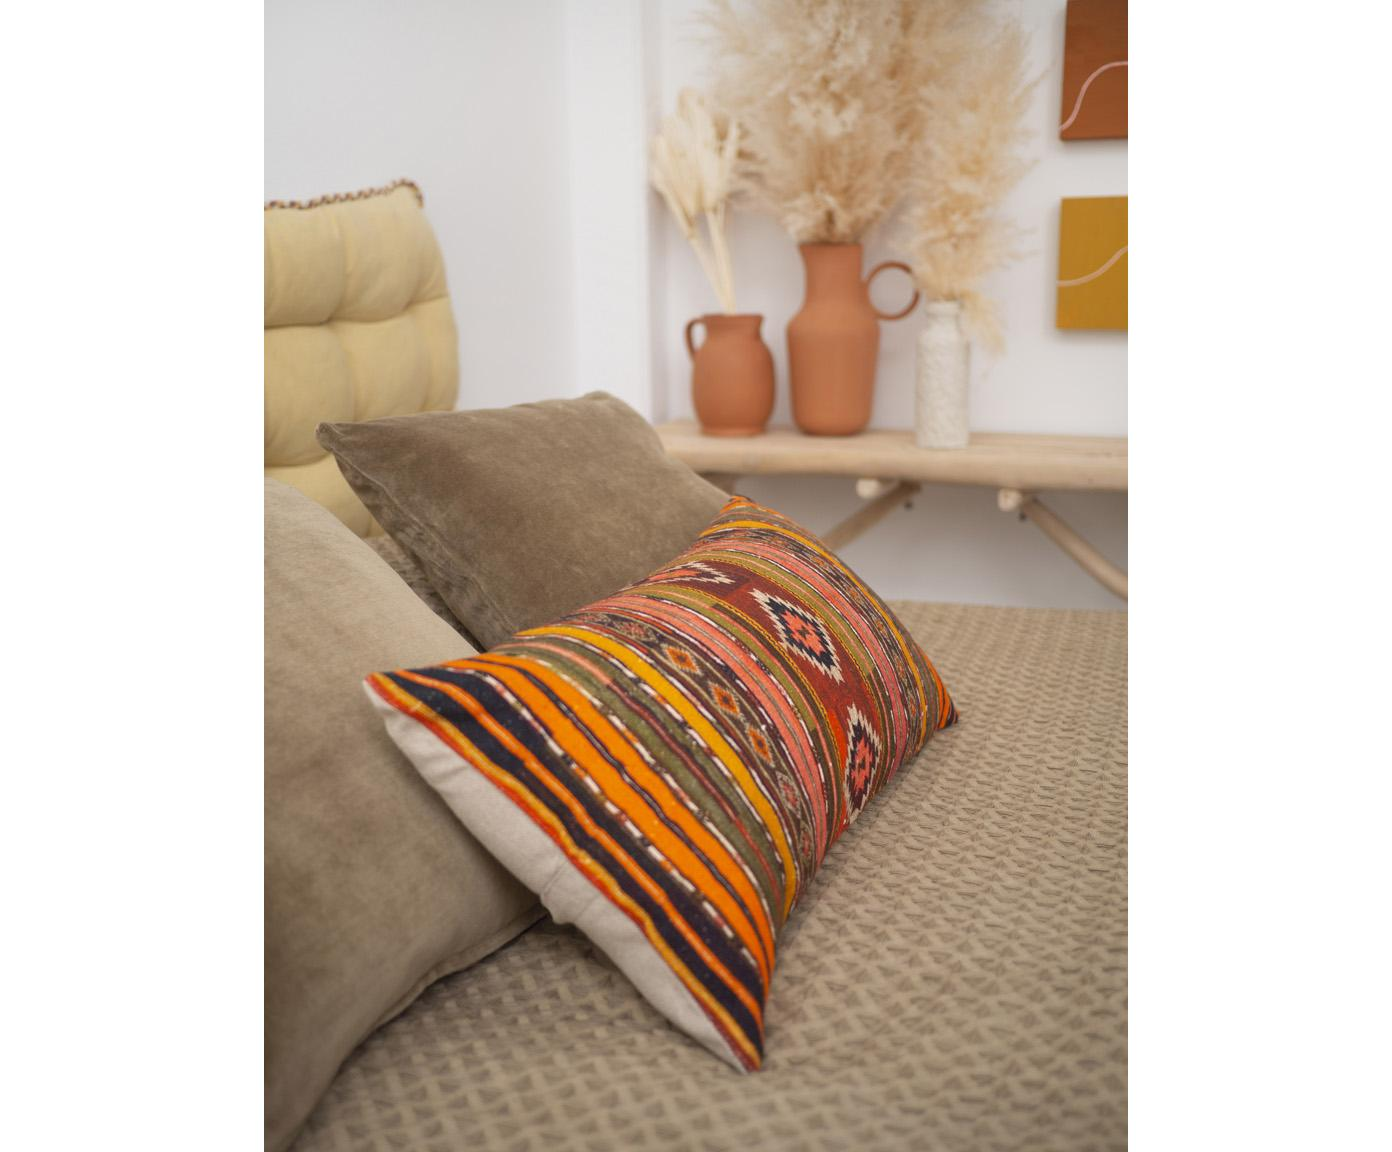 Kissenhülle Kusa mit Ethnomuster, 100% Baumwolle, Mehrfarbig, 30 x 60 cm